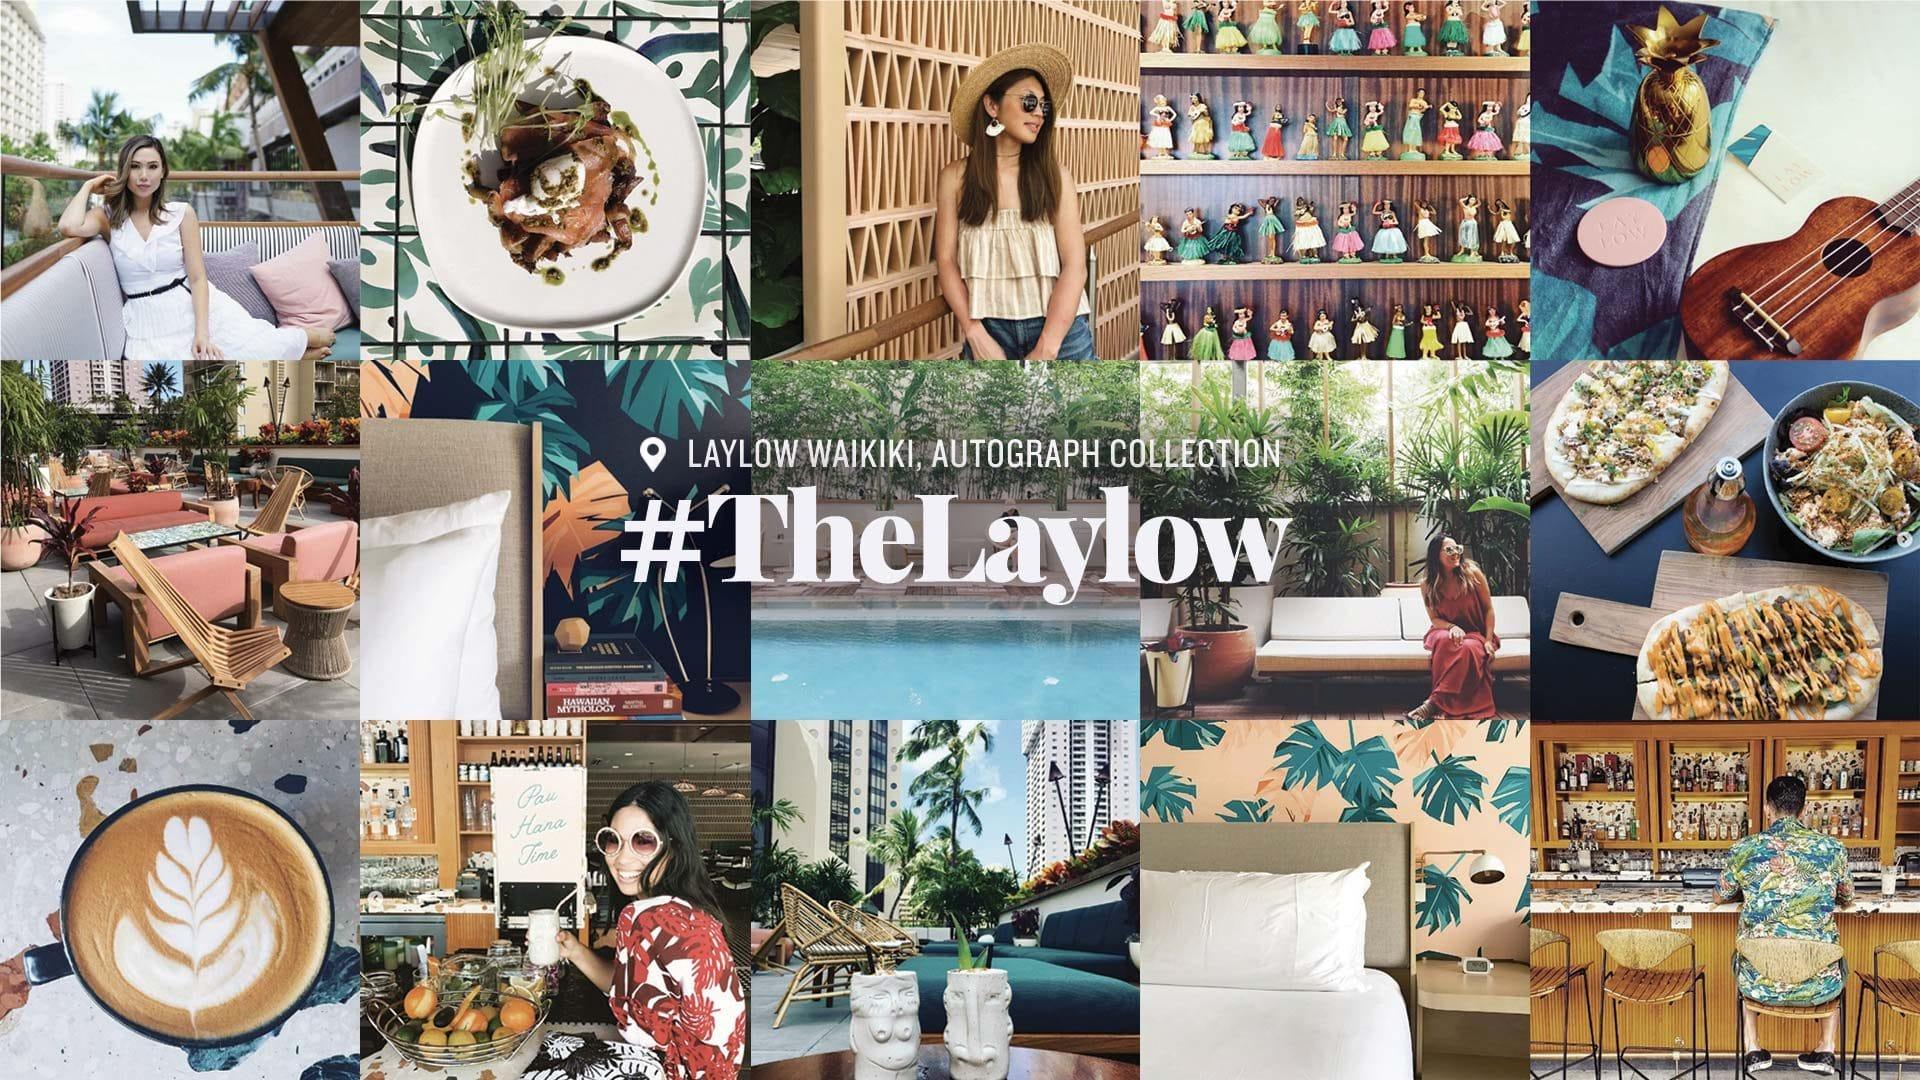 The LayLow Waikiki UGC